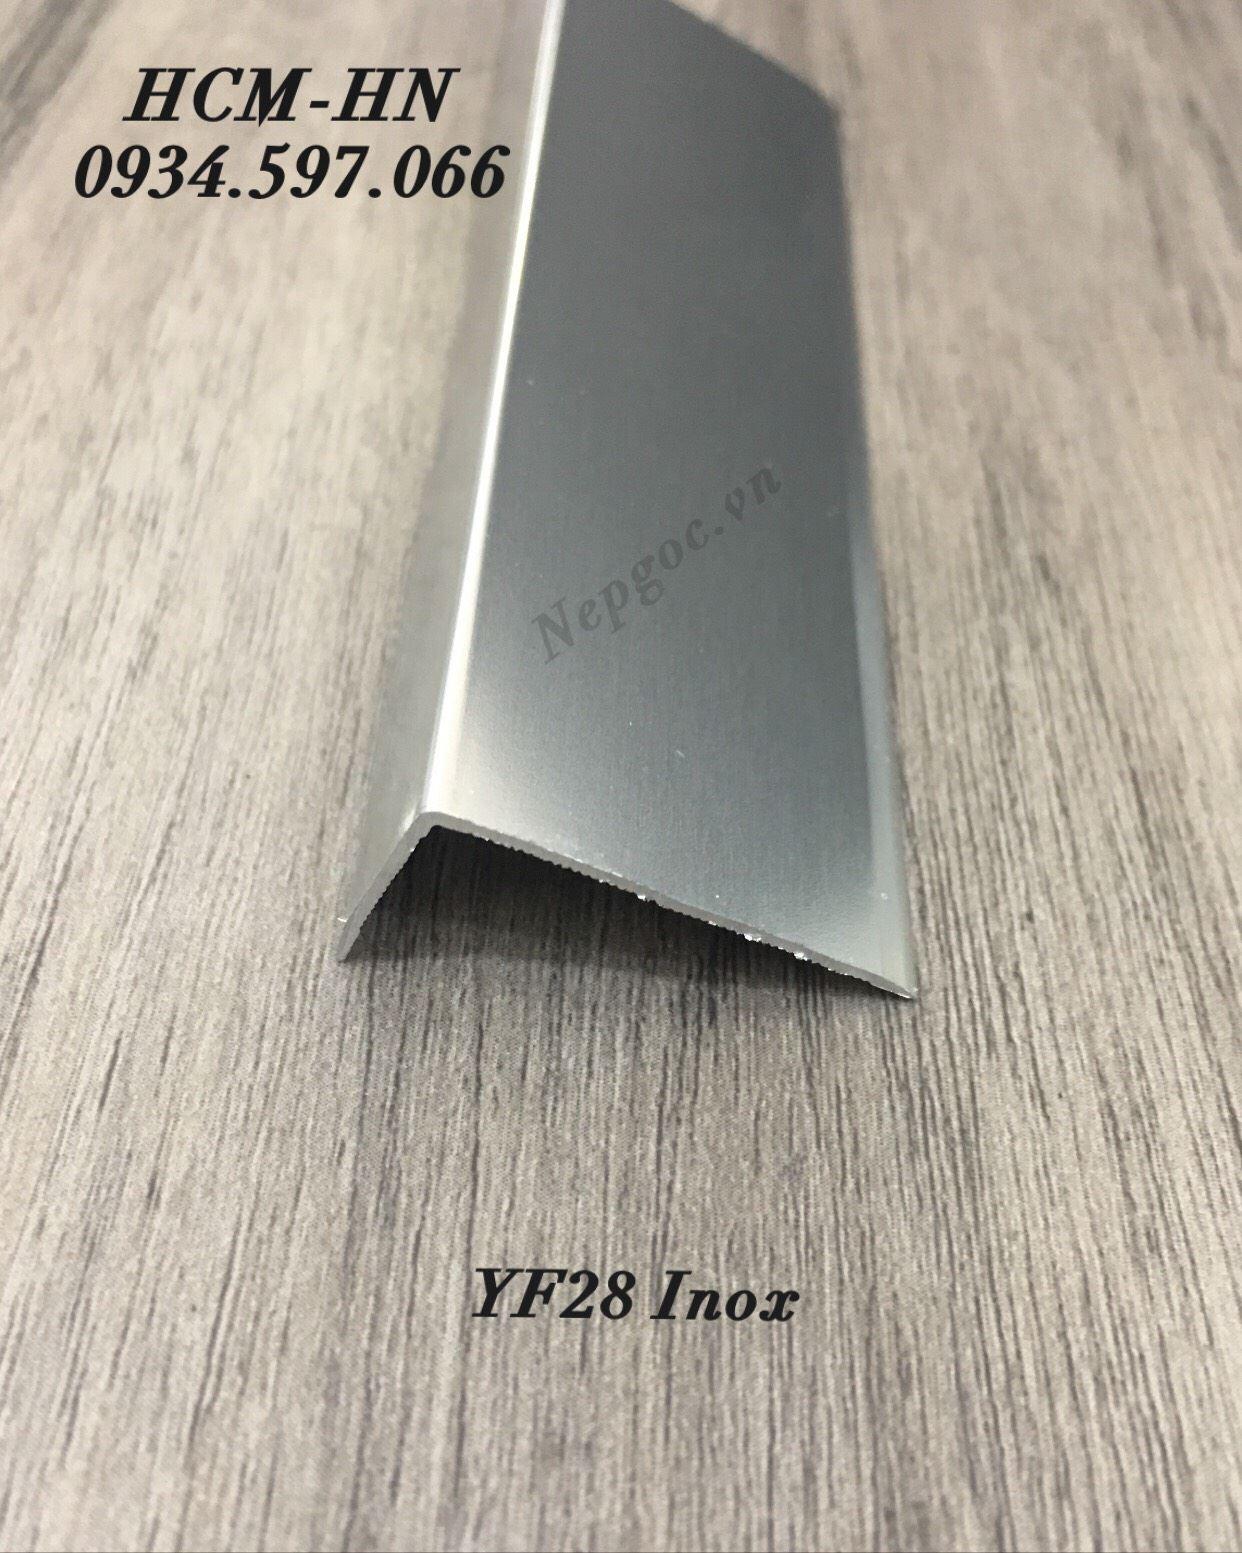 Nẹp nhôm YF28